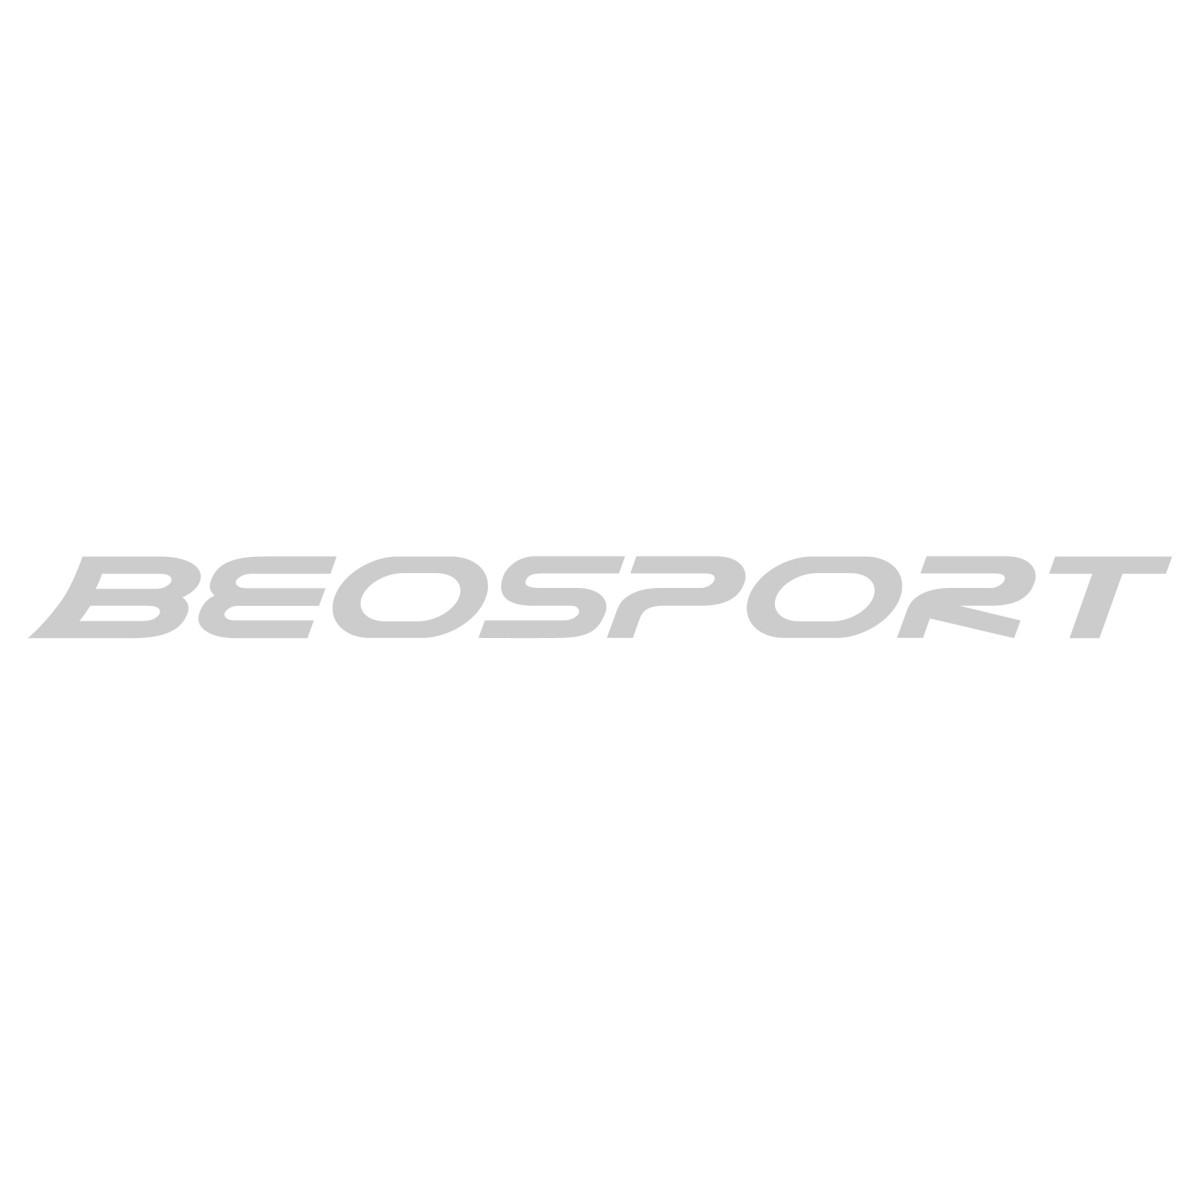 Wilson NBA Team Mini Hoop Hou Rockets